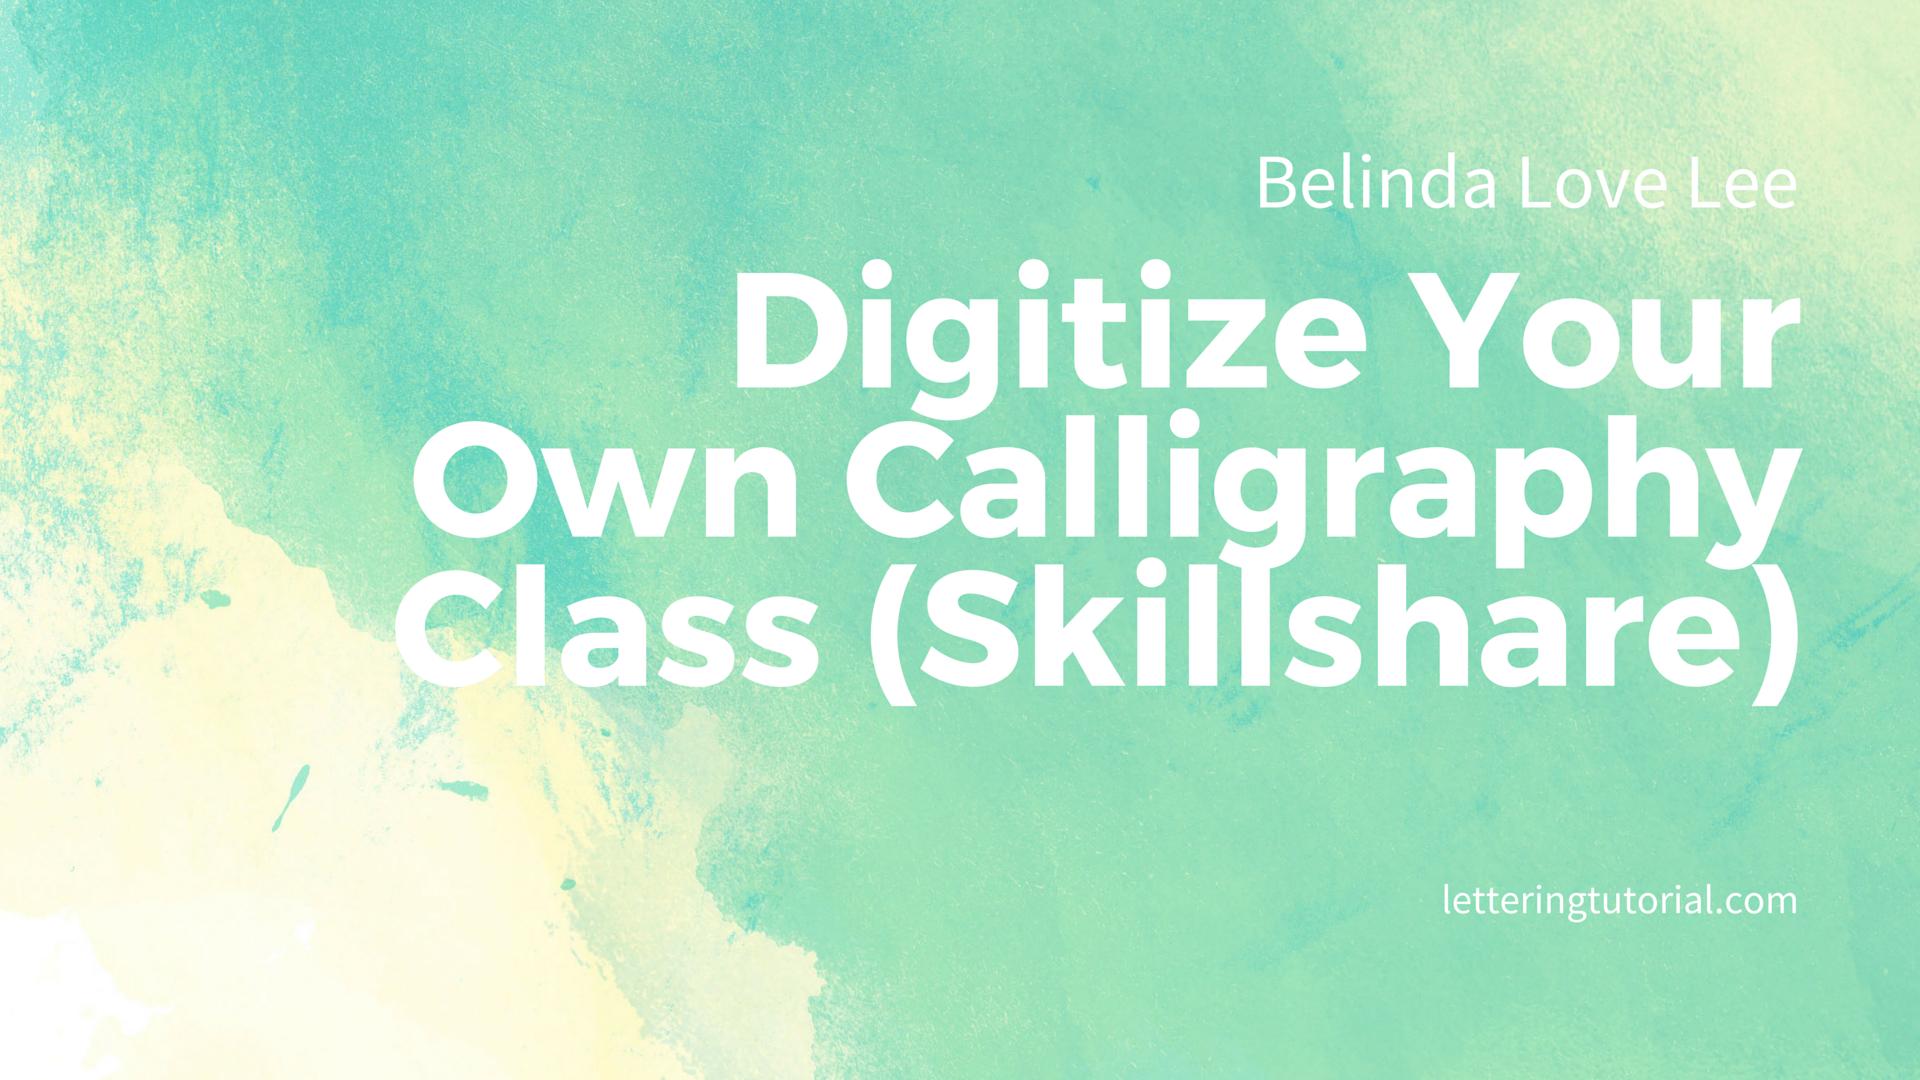 Belinda Love Lee Digitize Your Own Calligraphy Class (Skillshare) - Lettering Tutorial